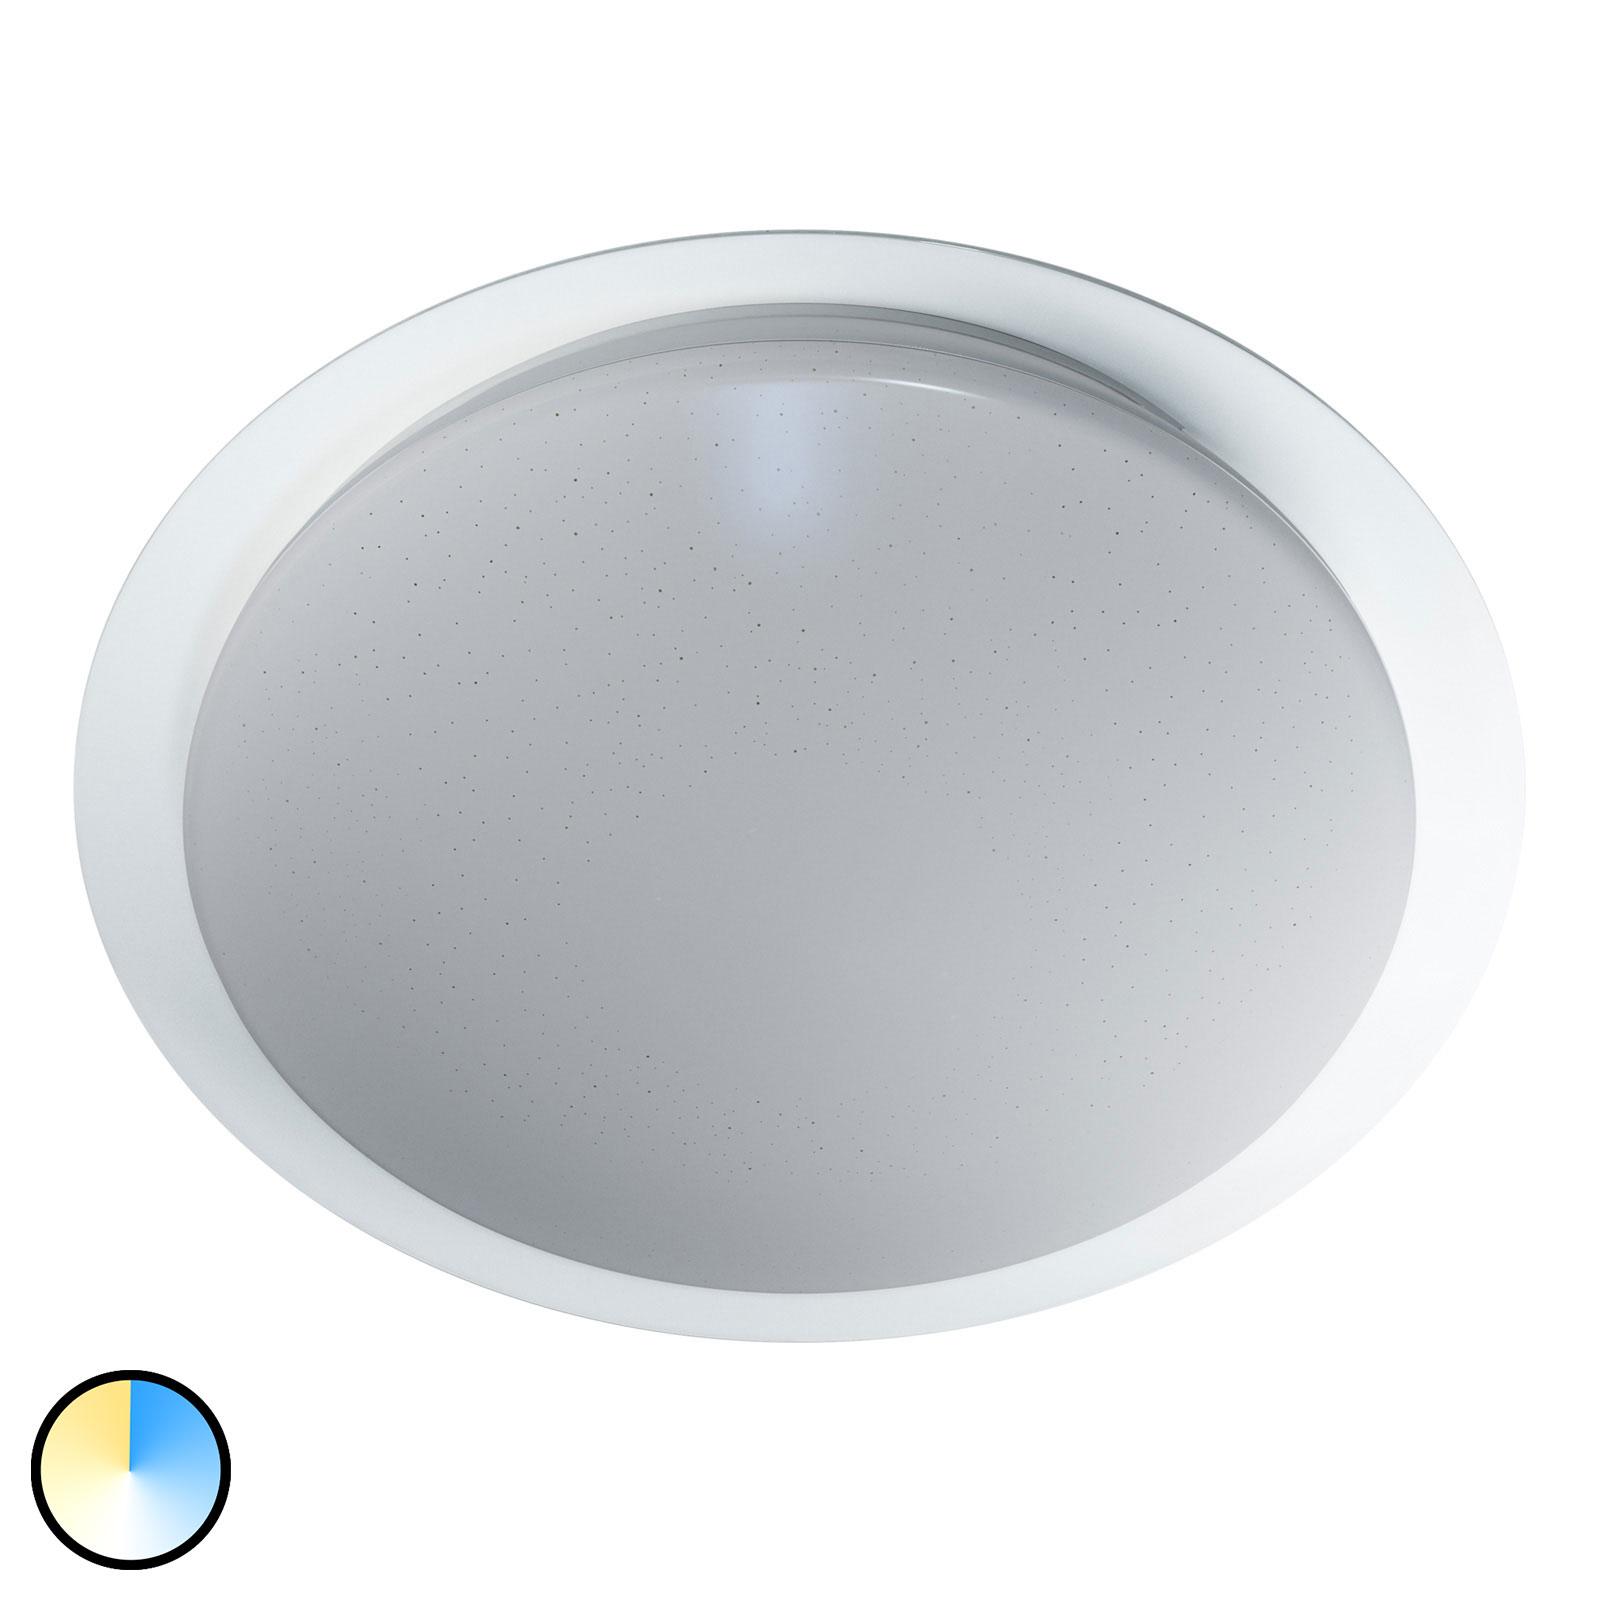 LEDVANCE Orbis Sparkle LED plafondlamp Remote 60